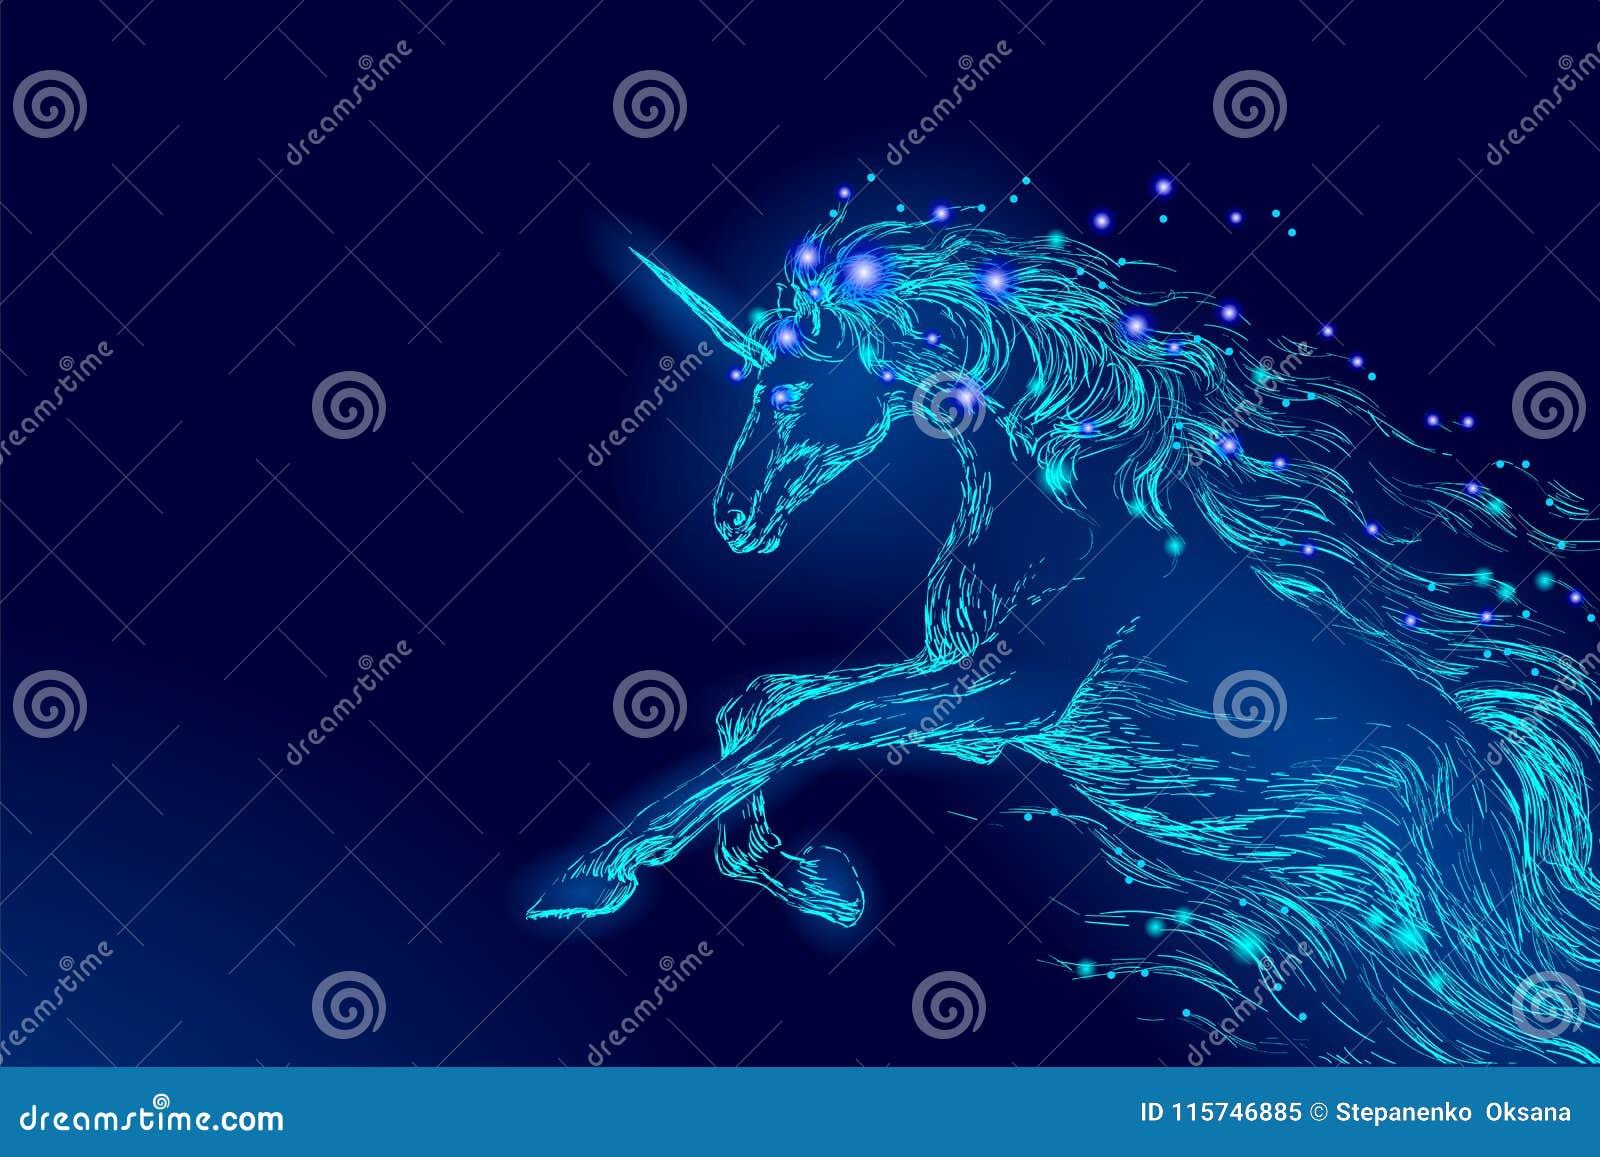 Estrella azul del cielo nocturno del montar a caballo del unicornio del caballo que brilla intensamente Hada brillante del cuerno